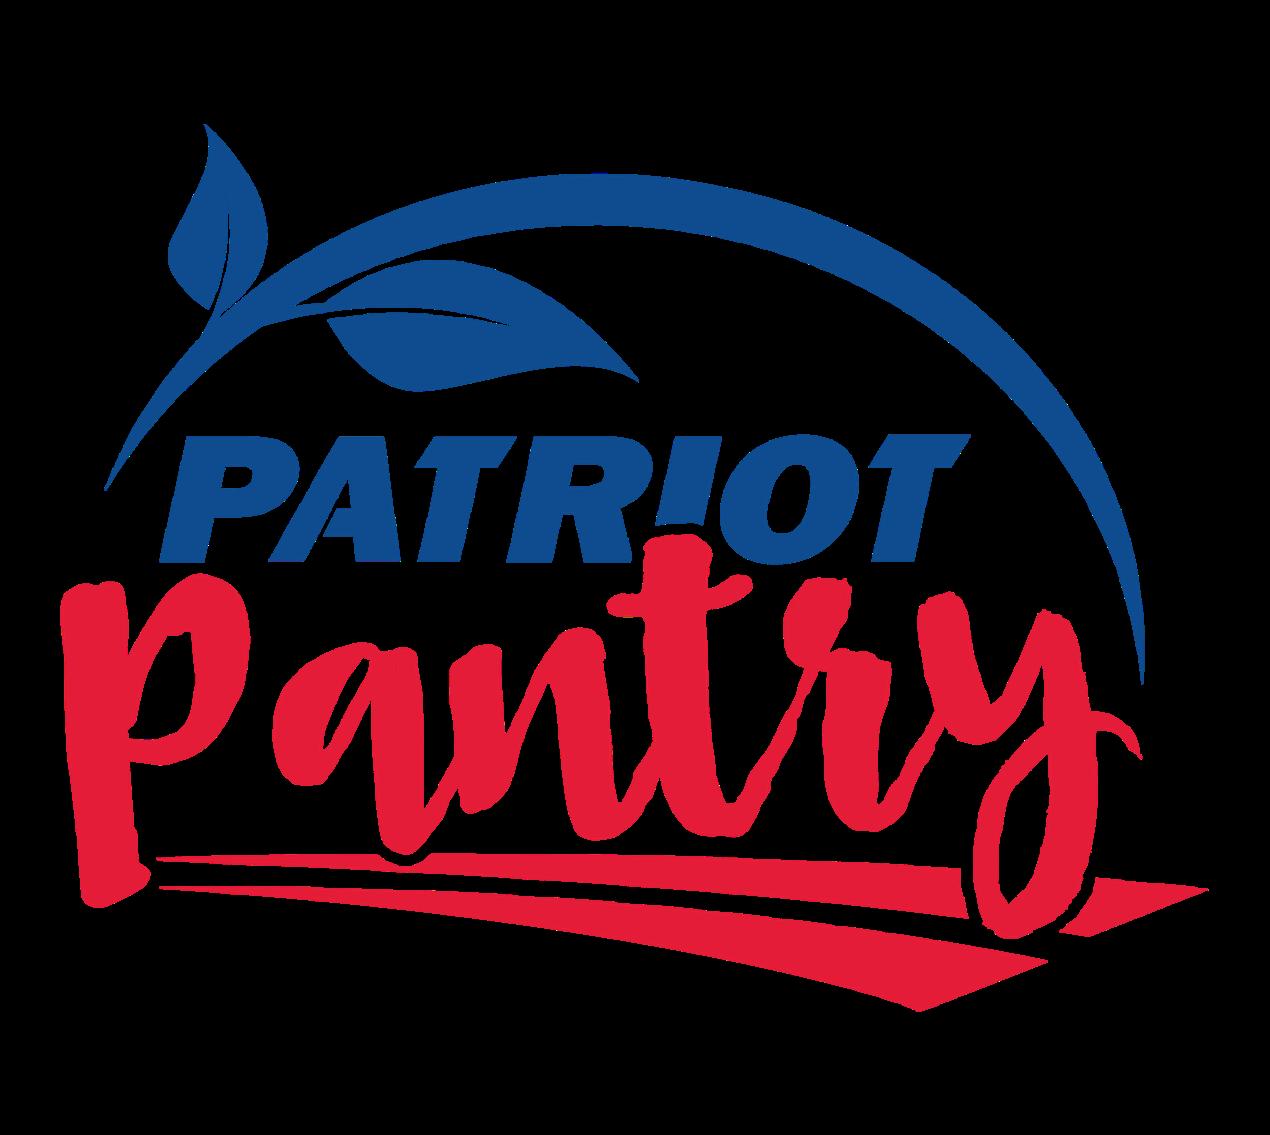 Patriot Pantry